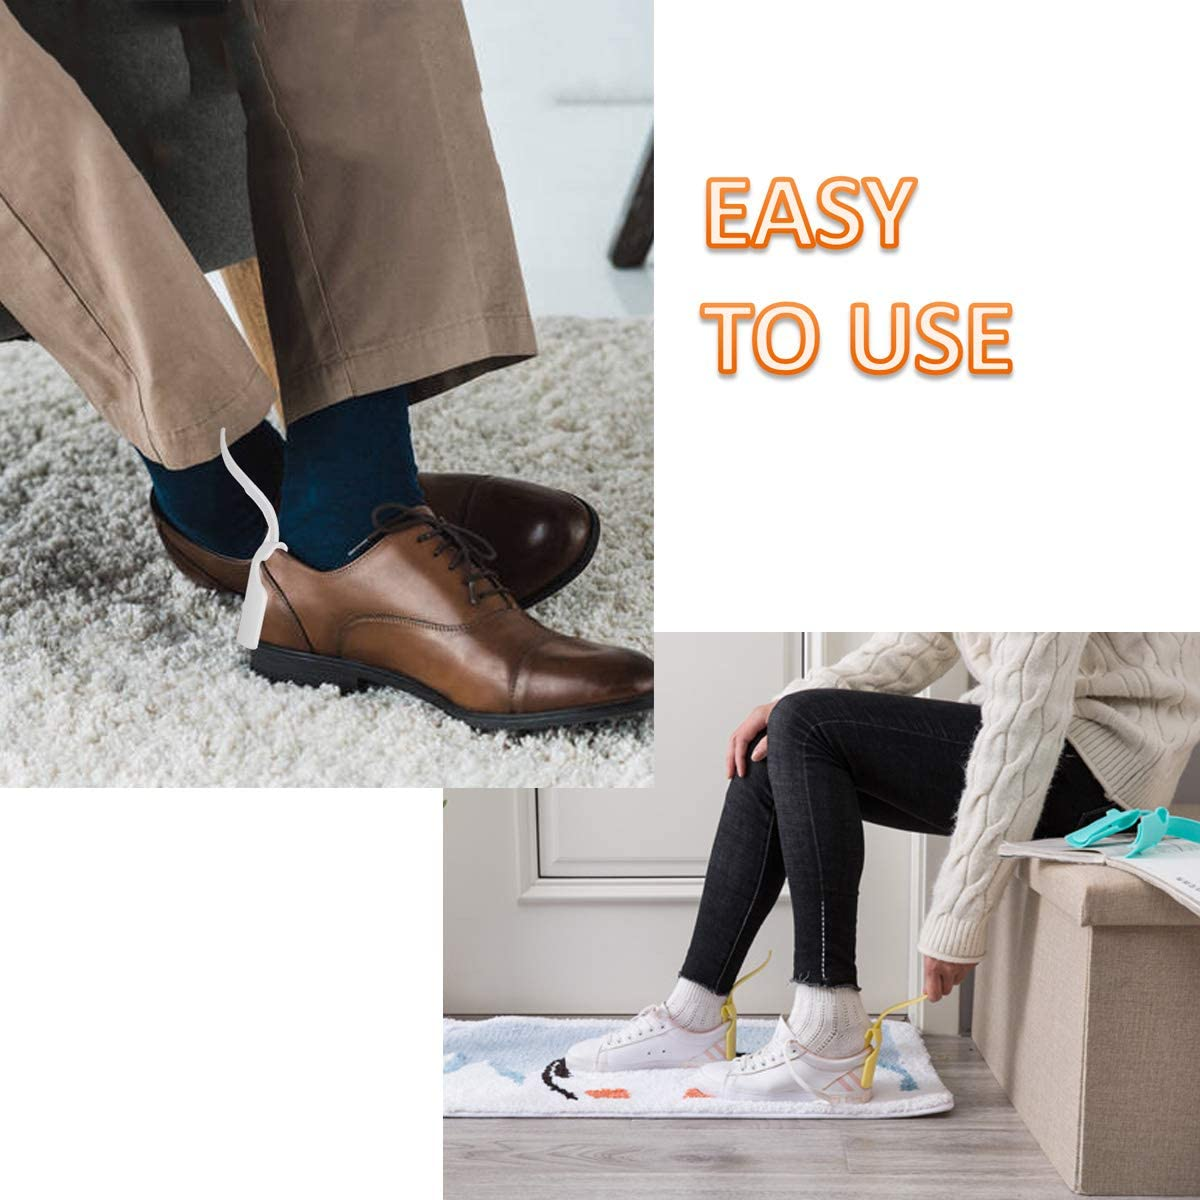 8 Pack Portable Lazy Shoes Helper Shoe Wear Helper Shoe Lifting Helper for Men Women Kids, Sock Slider Handled Shoe Horn for Seniors, Elderly, Disabled, Fits All Shoes, Blue and Grey: Shoes